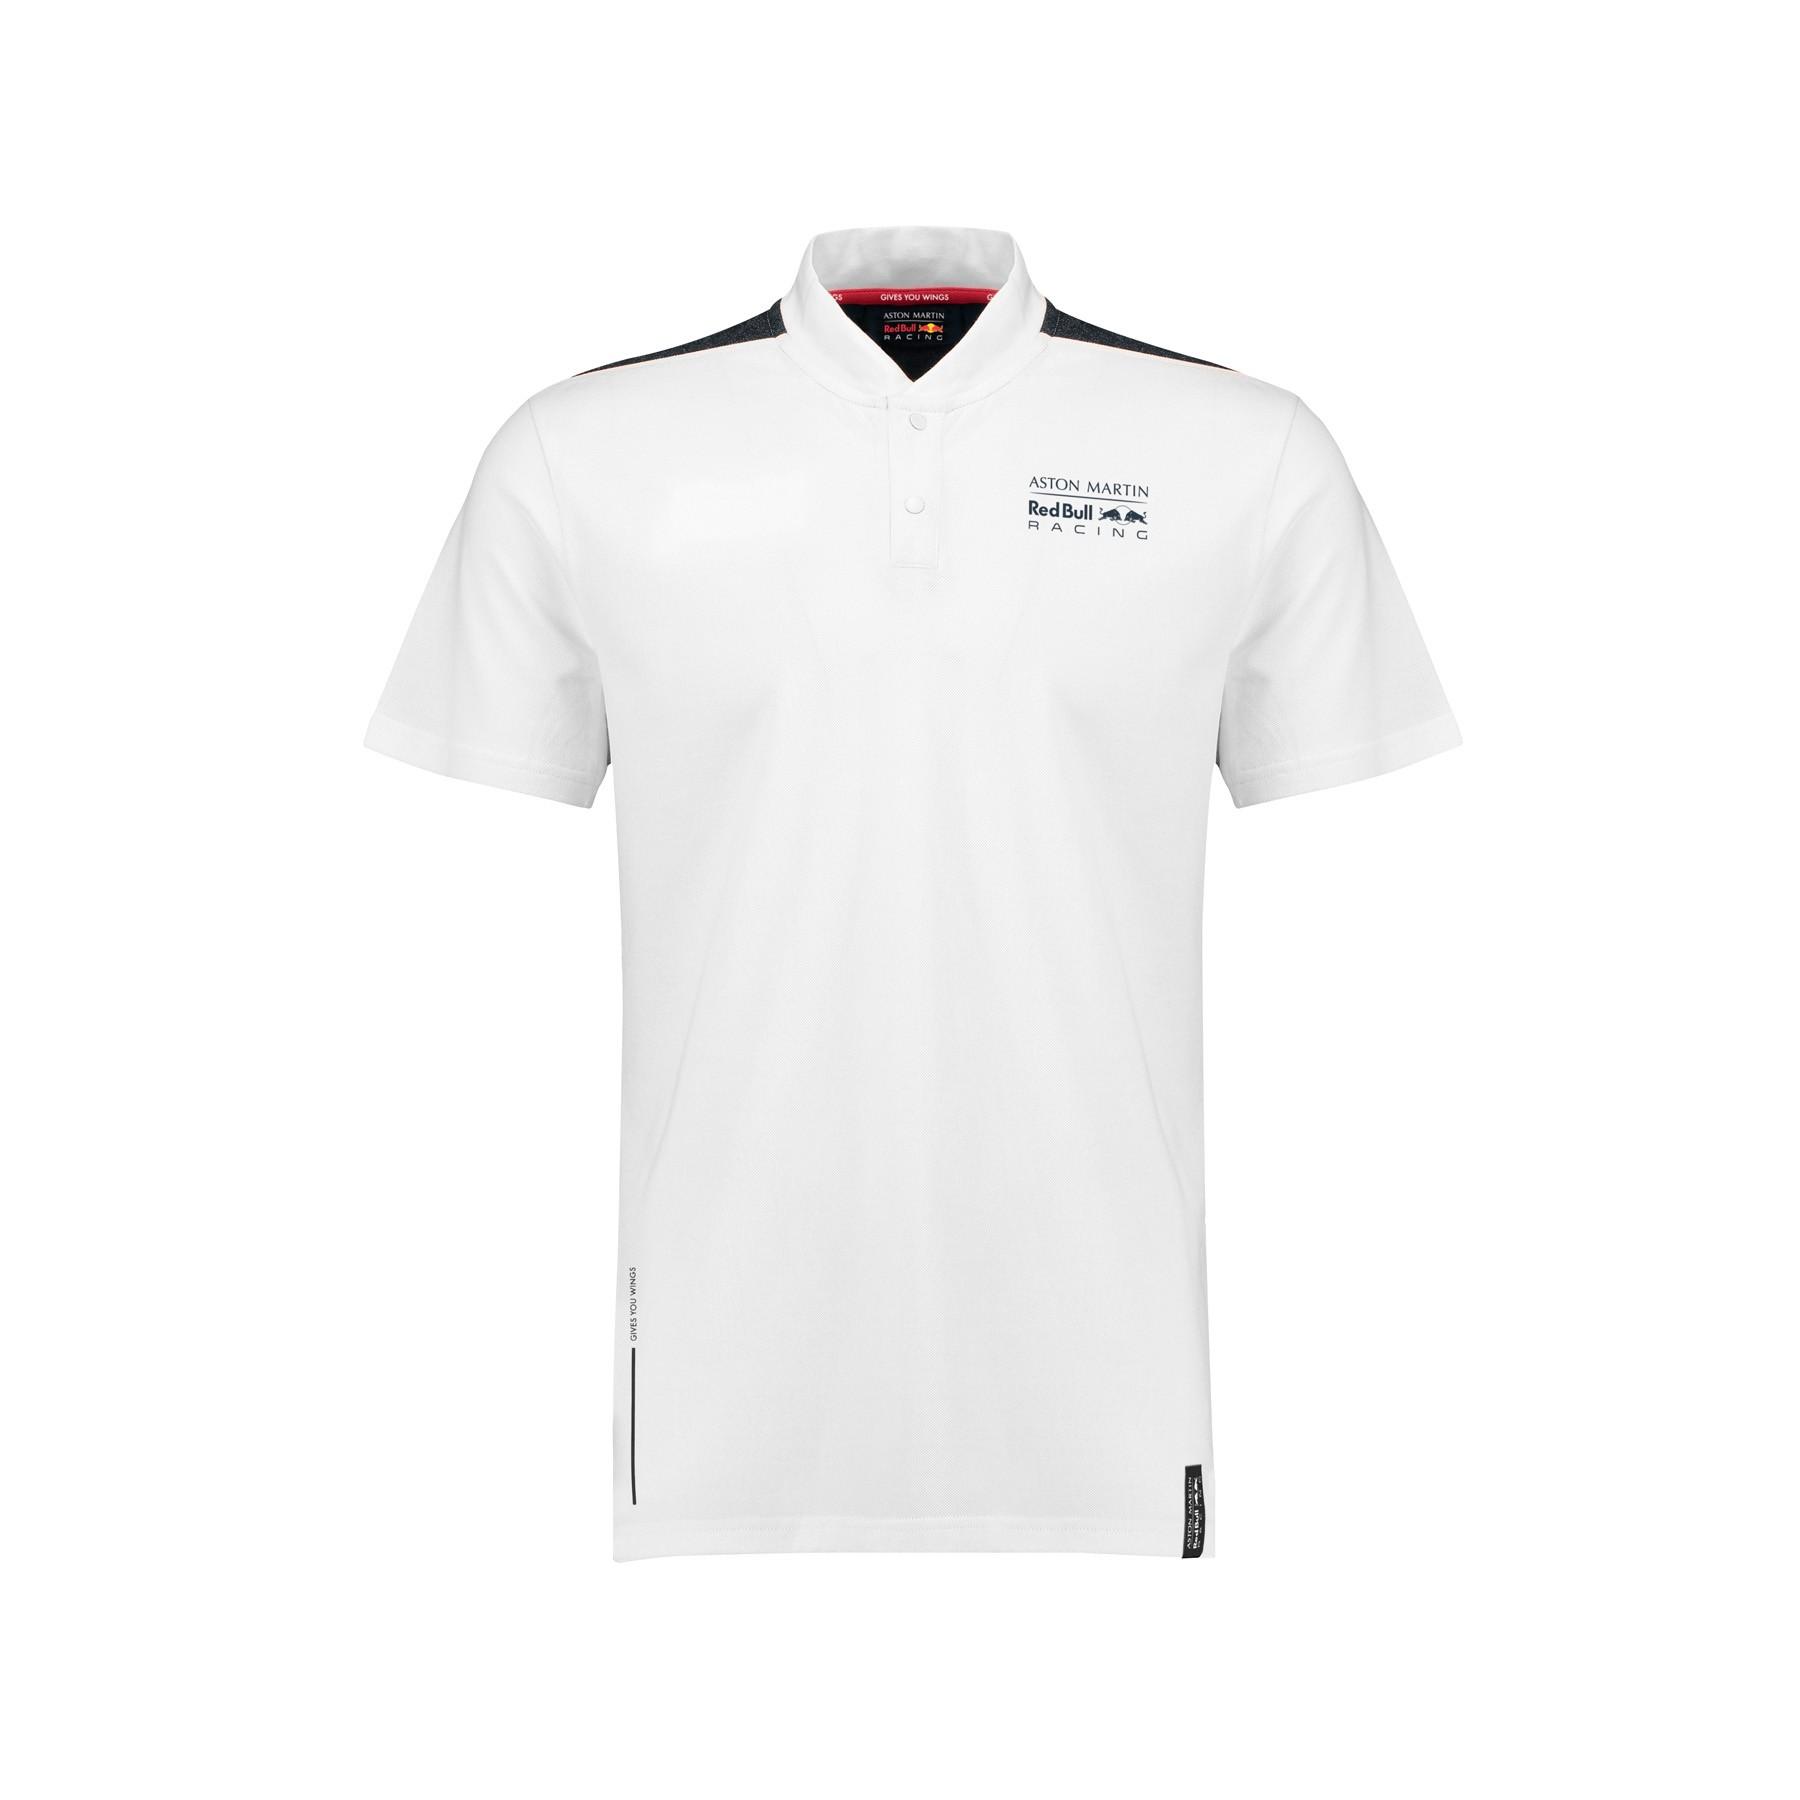 2018 aston martin red bull racing mens seasonal polo shirt formula